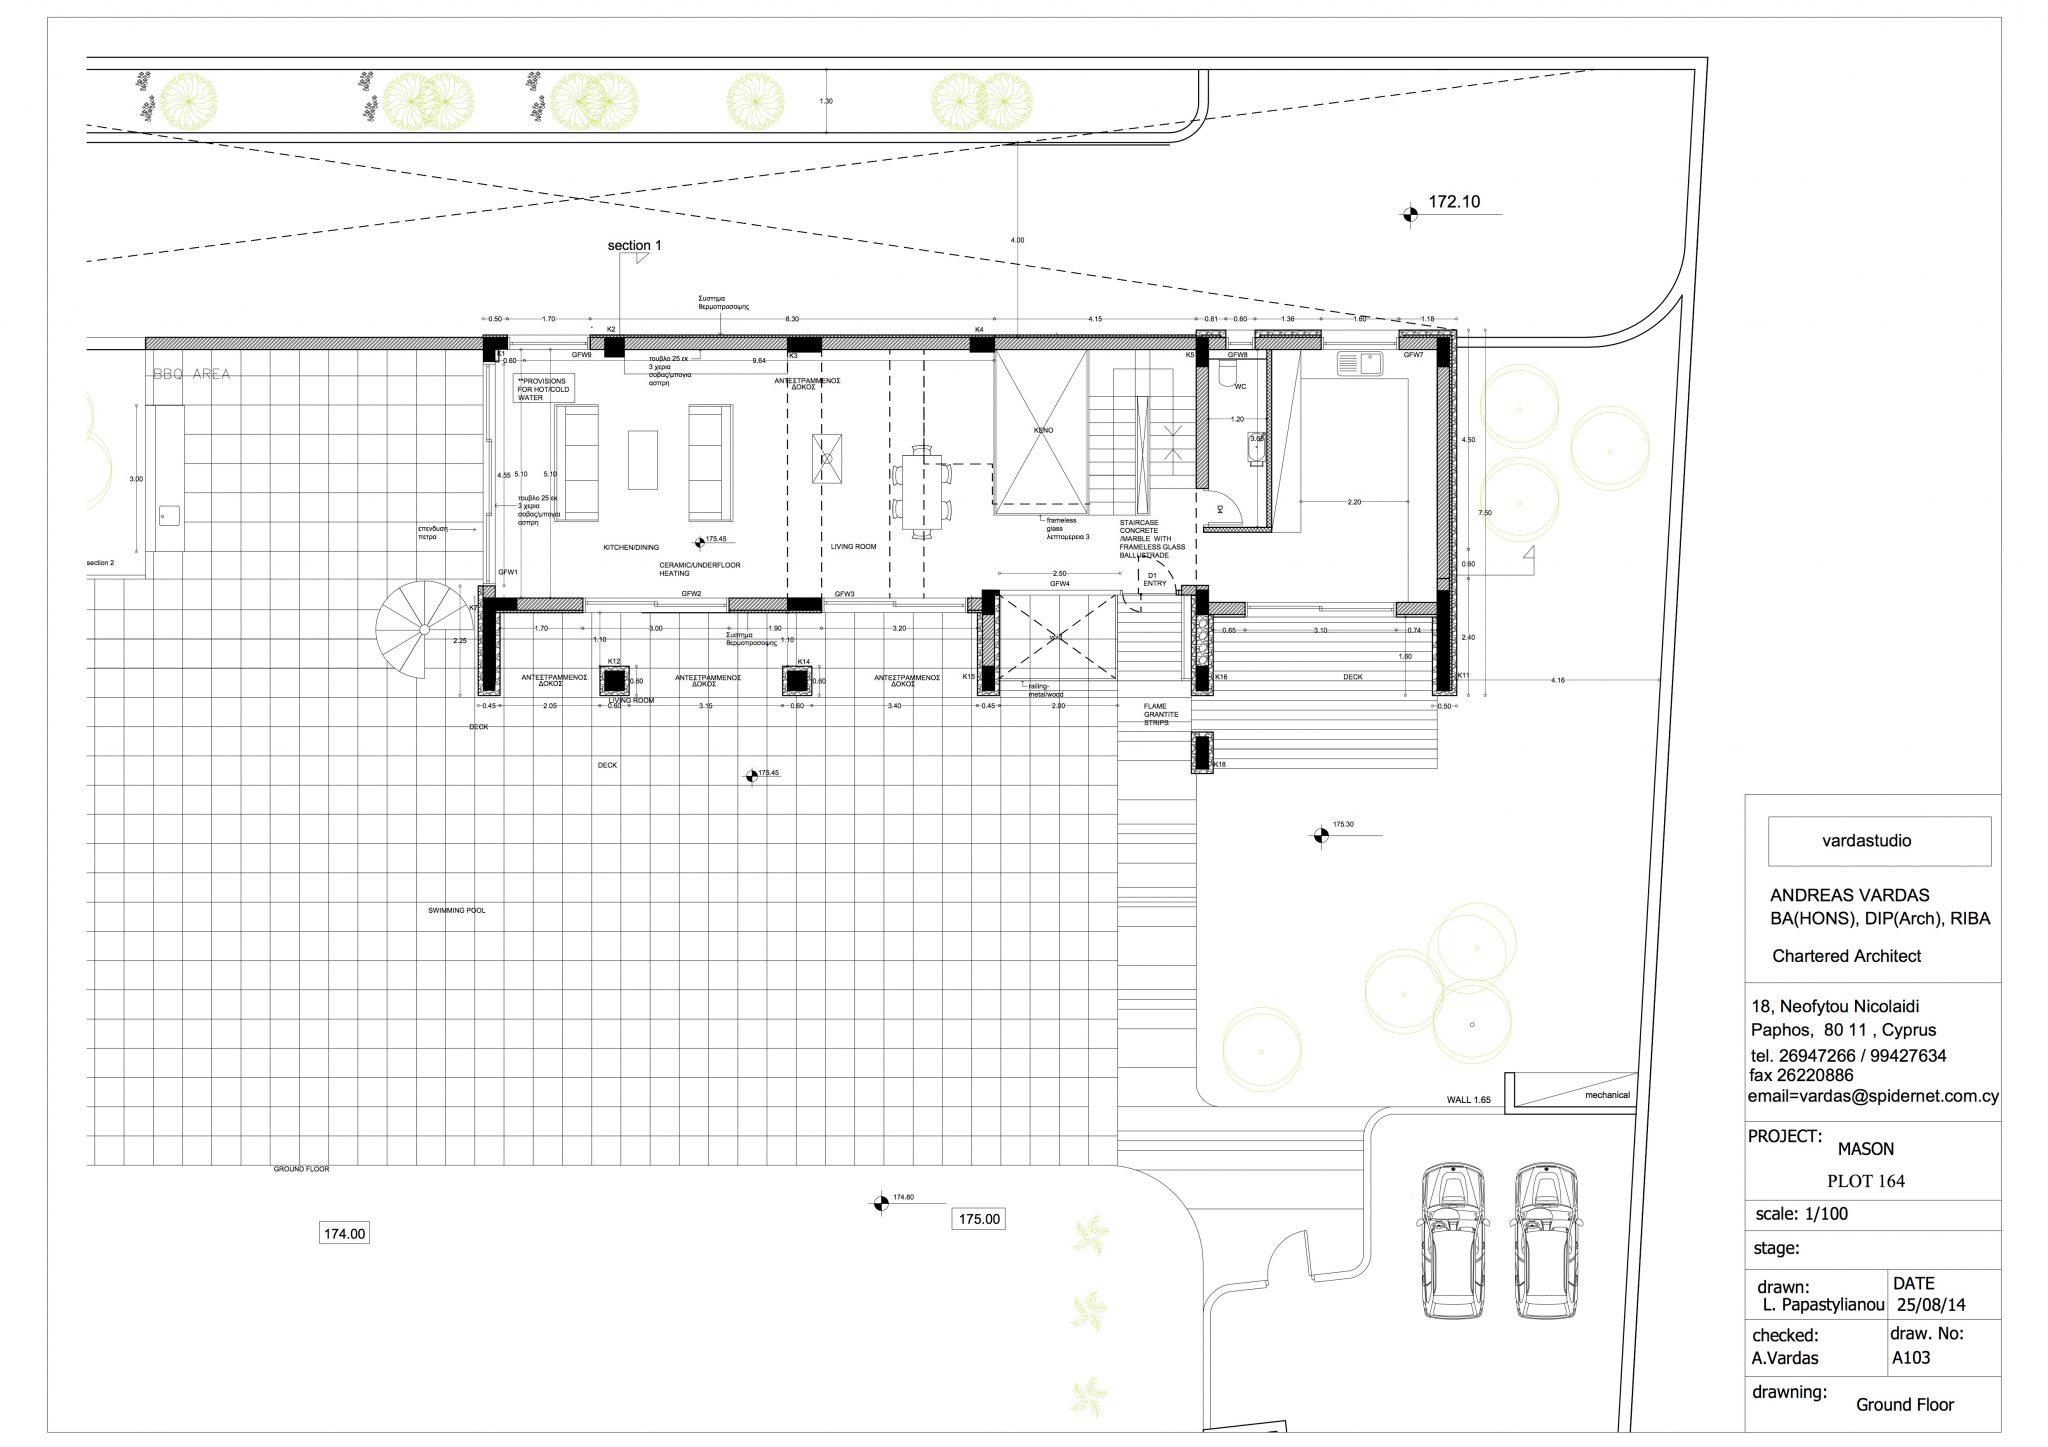 1538 - 5 Bedroom Villa - Aphrodite Hills floorplan 2